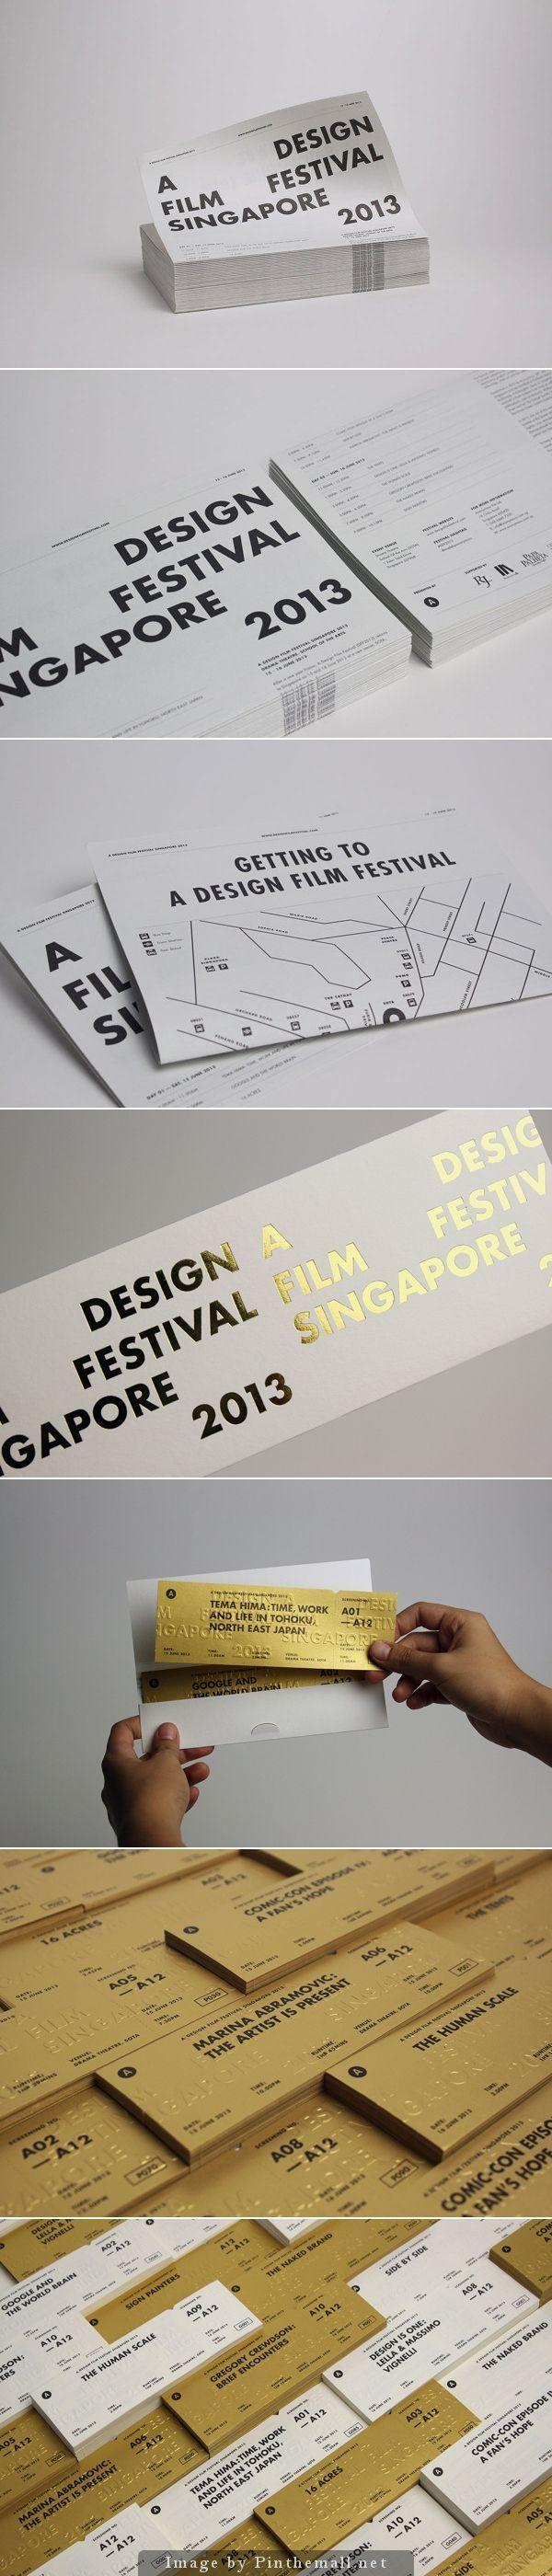 Design Film Festival Singaport | Graphics | Pinterest